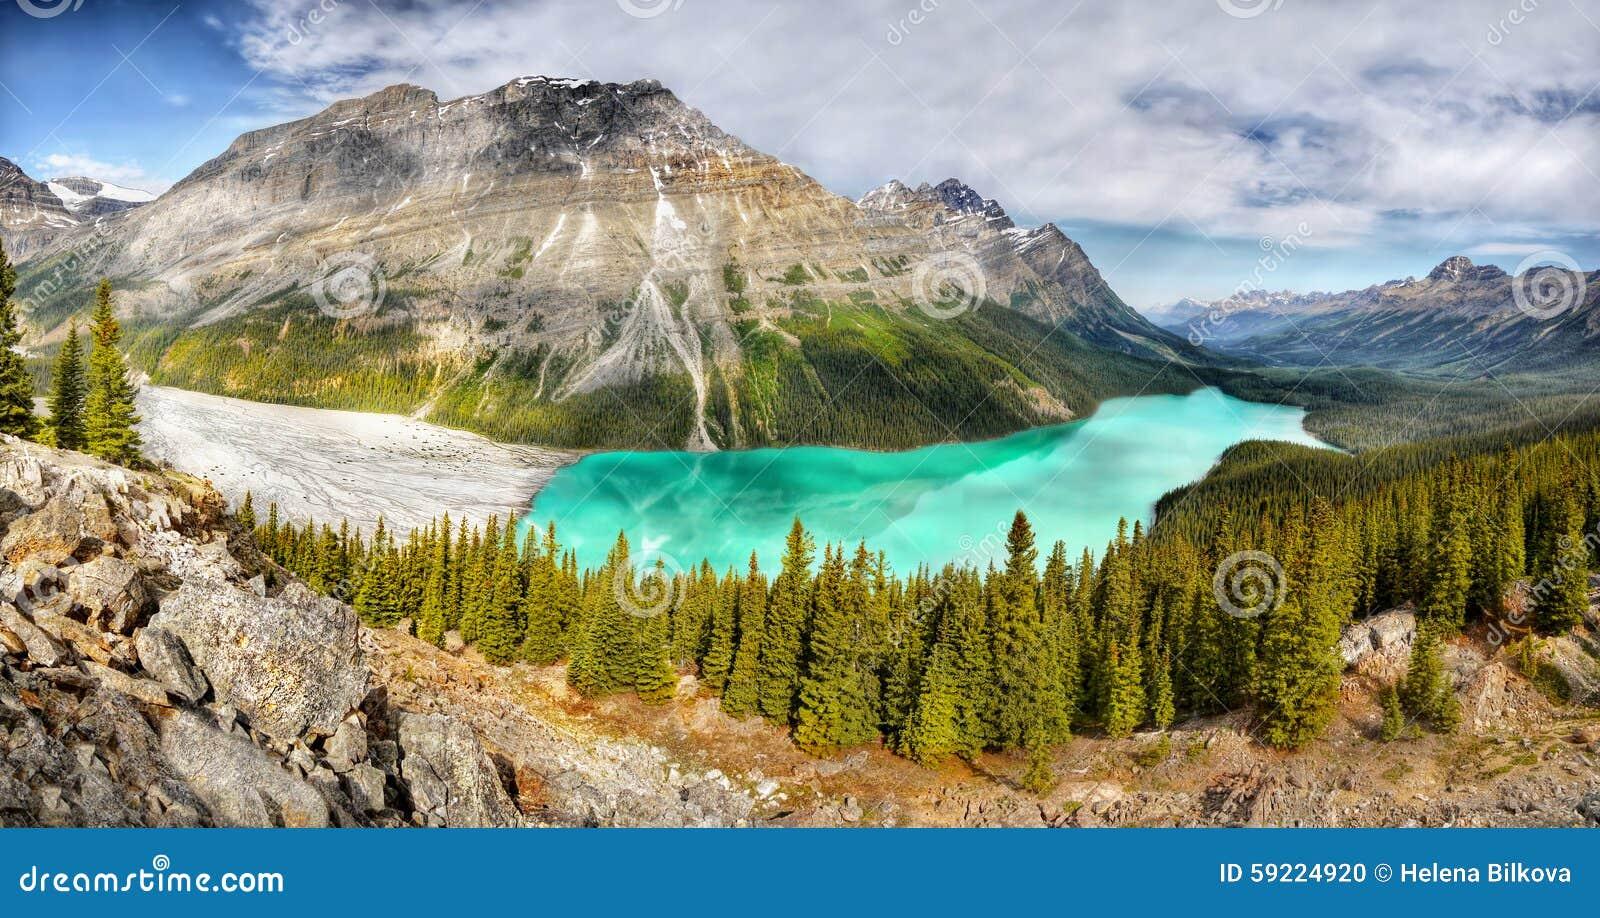 Landscape, Mountains, Peyto Lake, Panorama, Canada